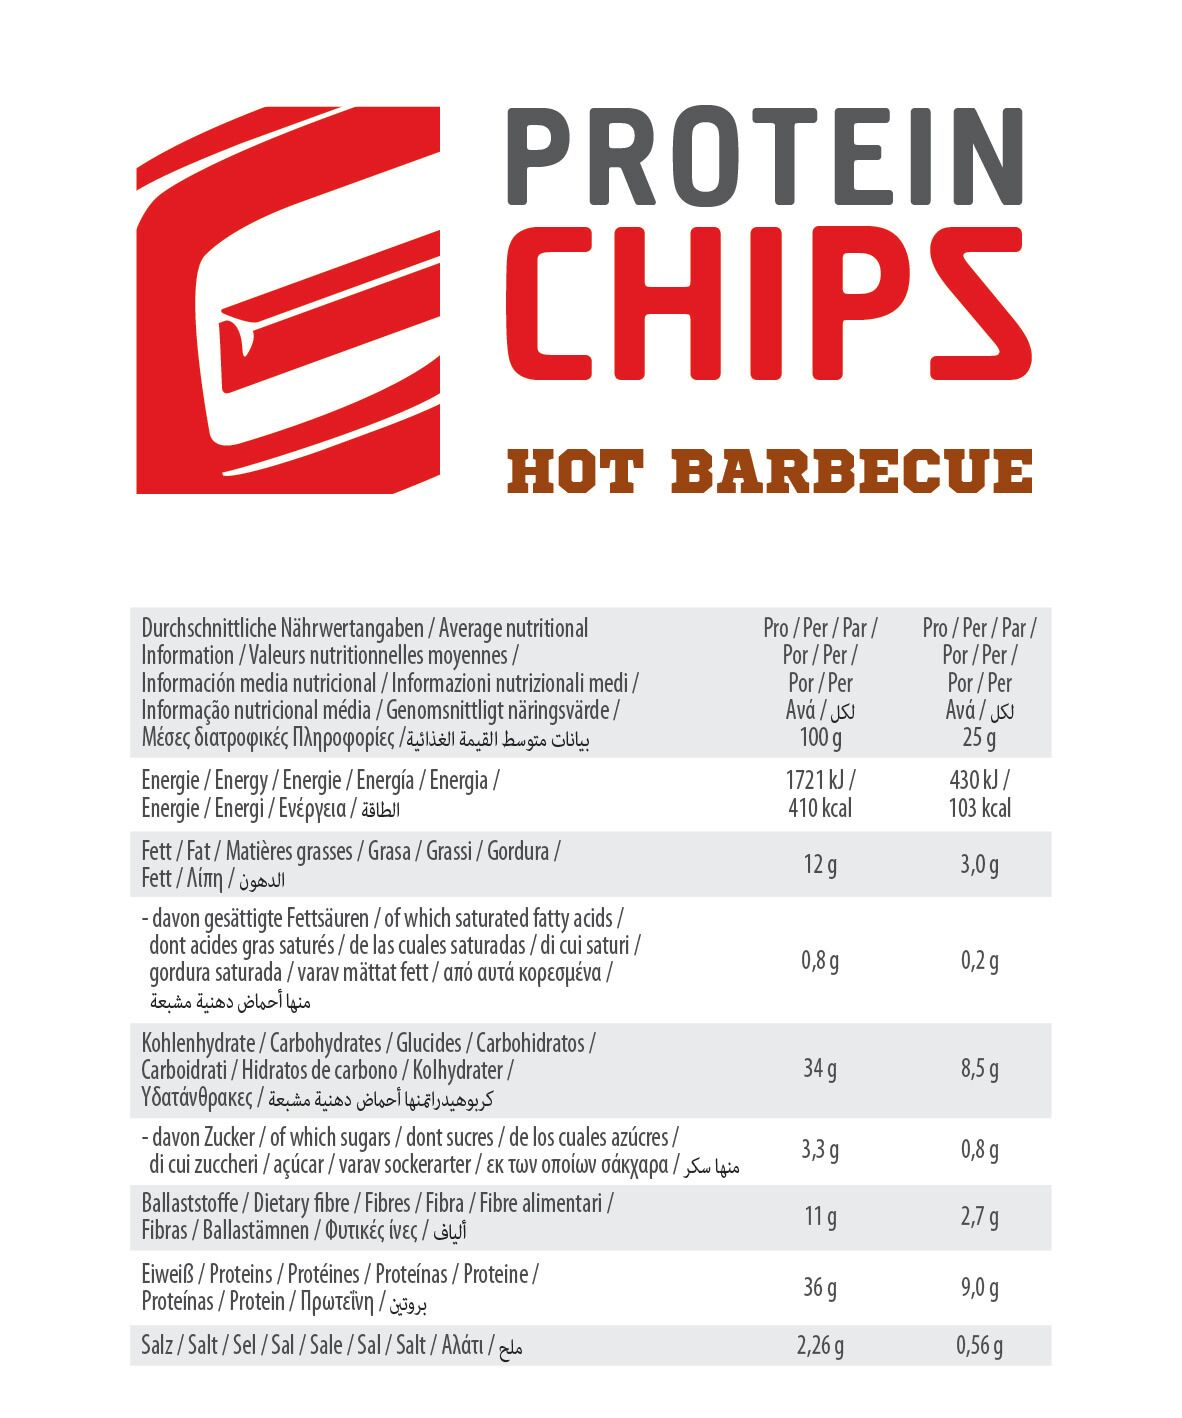 N-hrwerte-Got7-Chips-Barbecue58ee395fb6e30